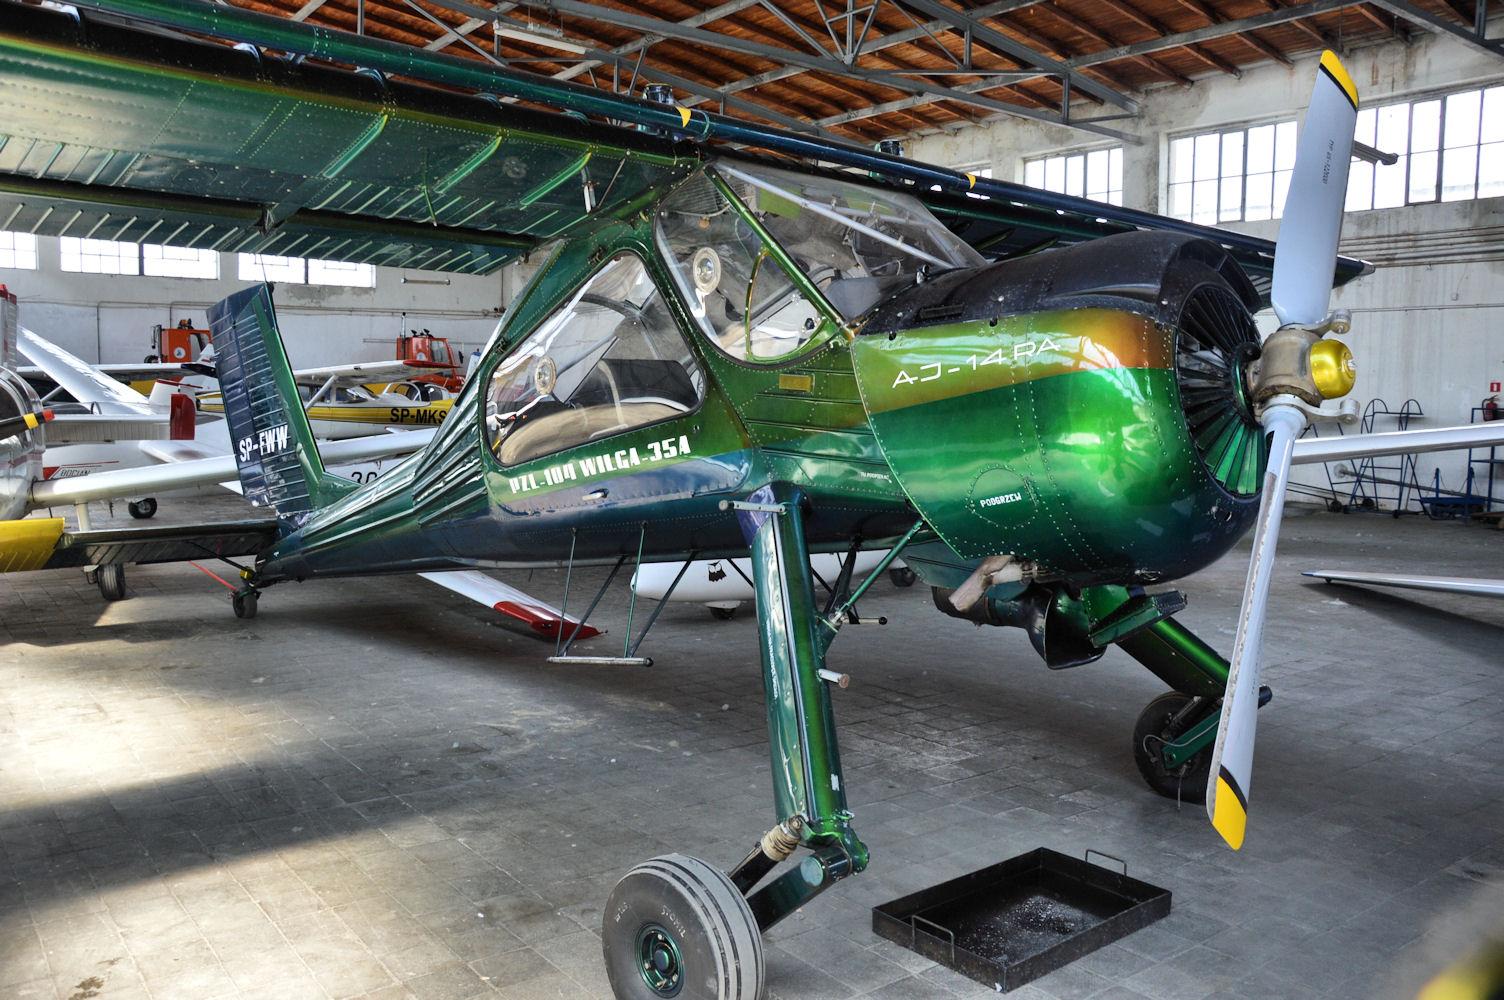 PZL 104 Wilga 35A SP-FWW   Sold aircraft   Plane4You